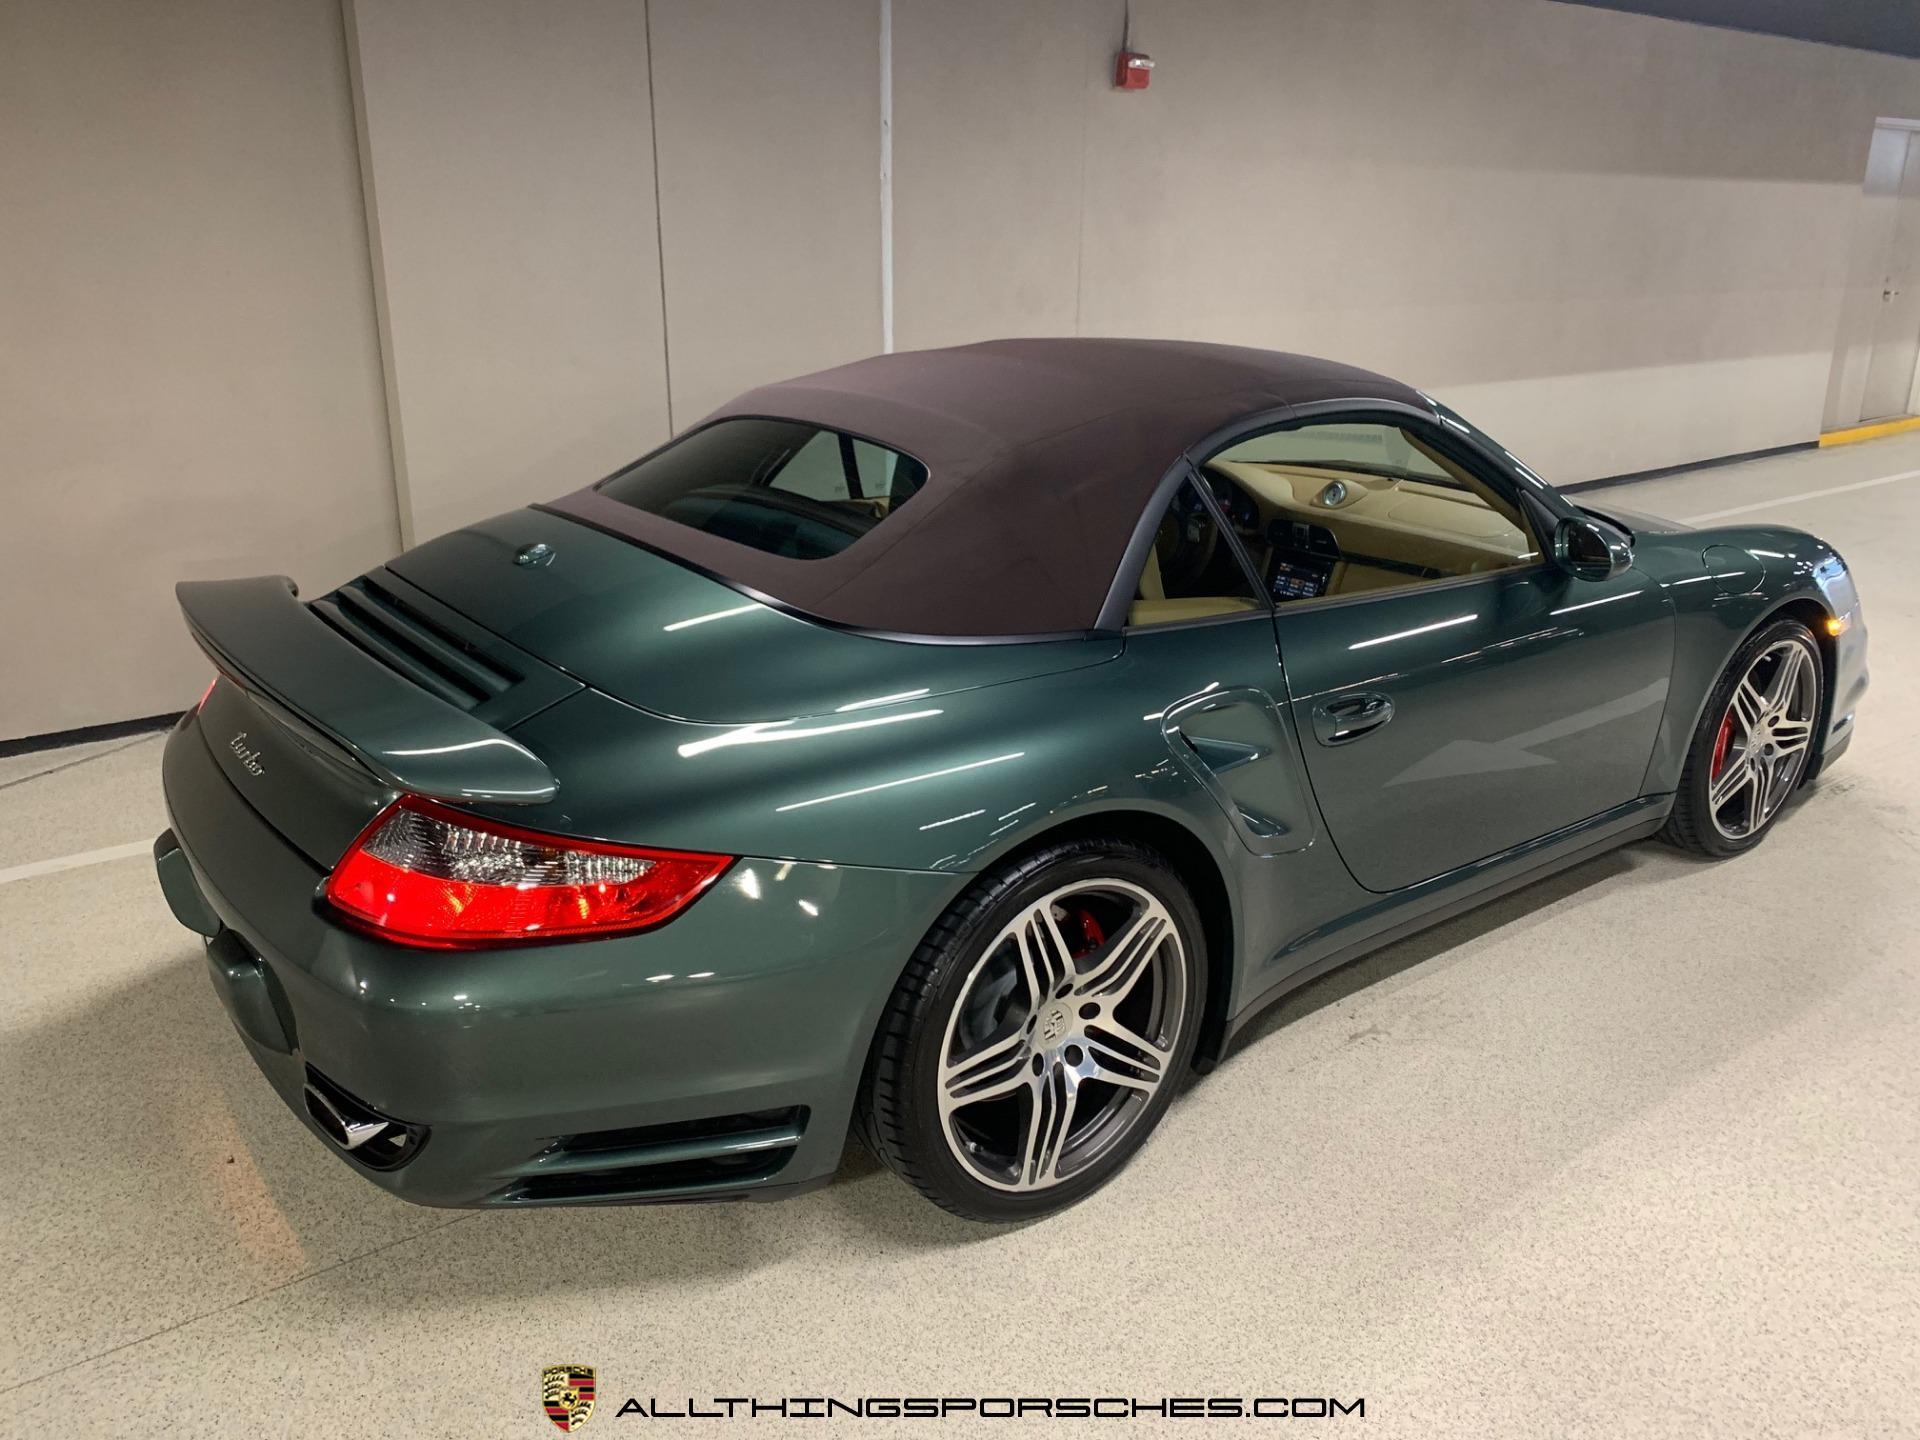 Used-2009-Porsche-911-Turbo-Cabriolet-Manual-Trans